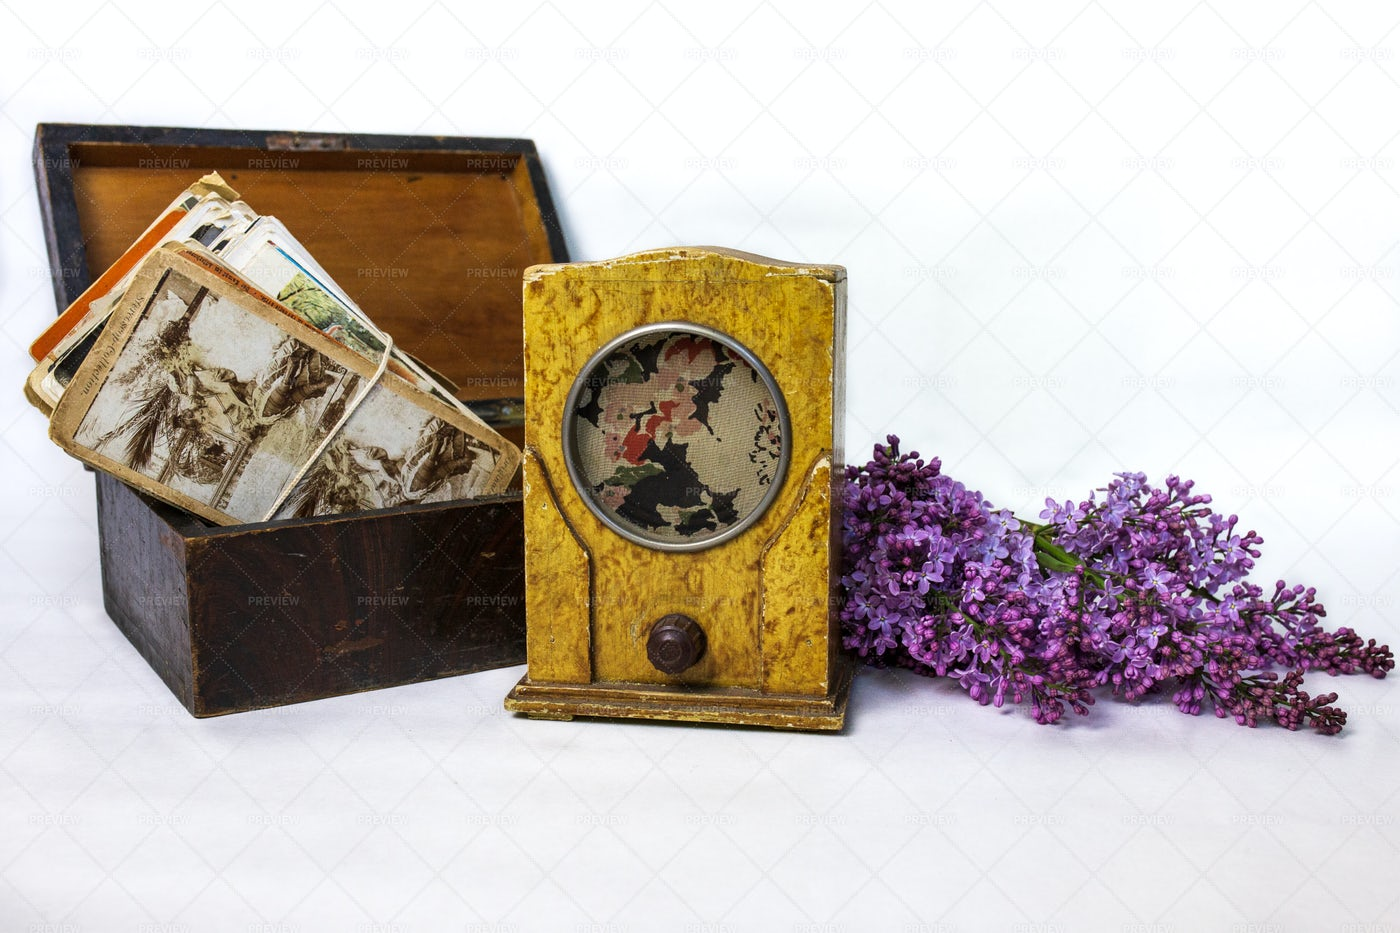 Retro Radio, Cards And Lilac: Stock Photos